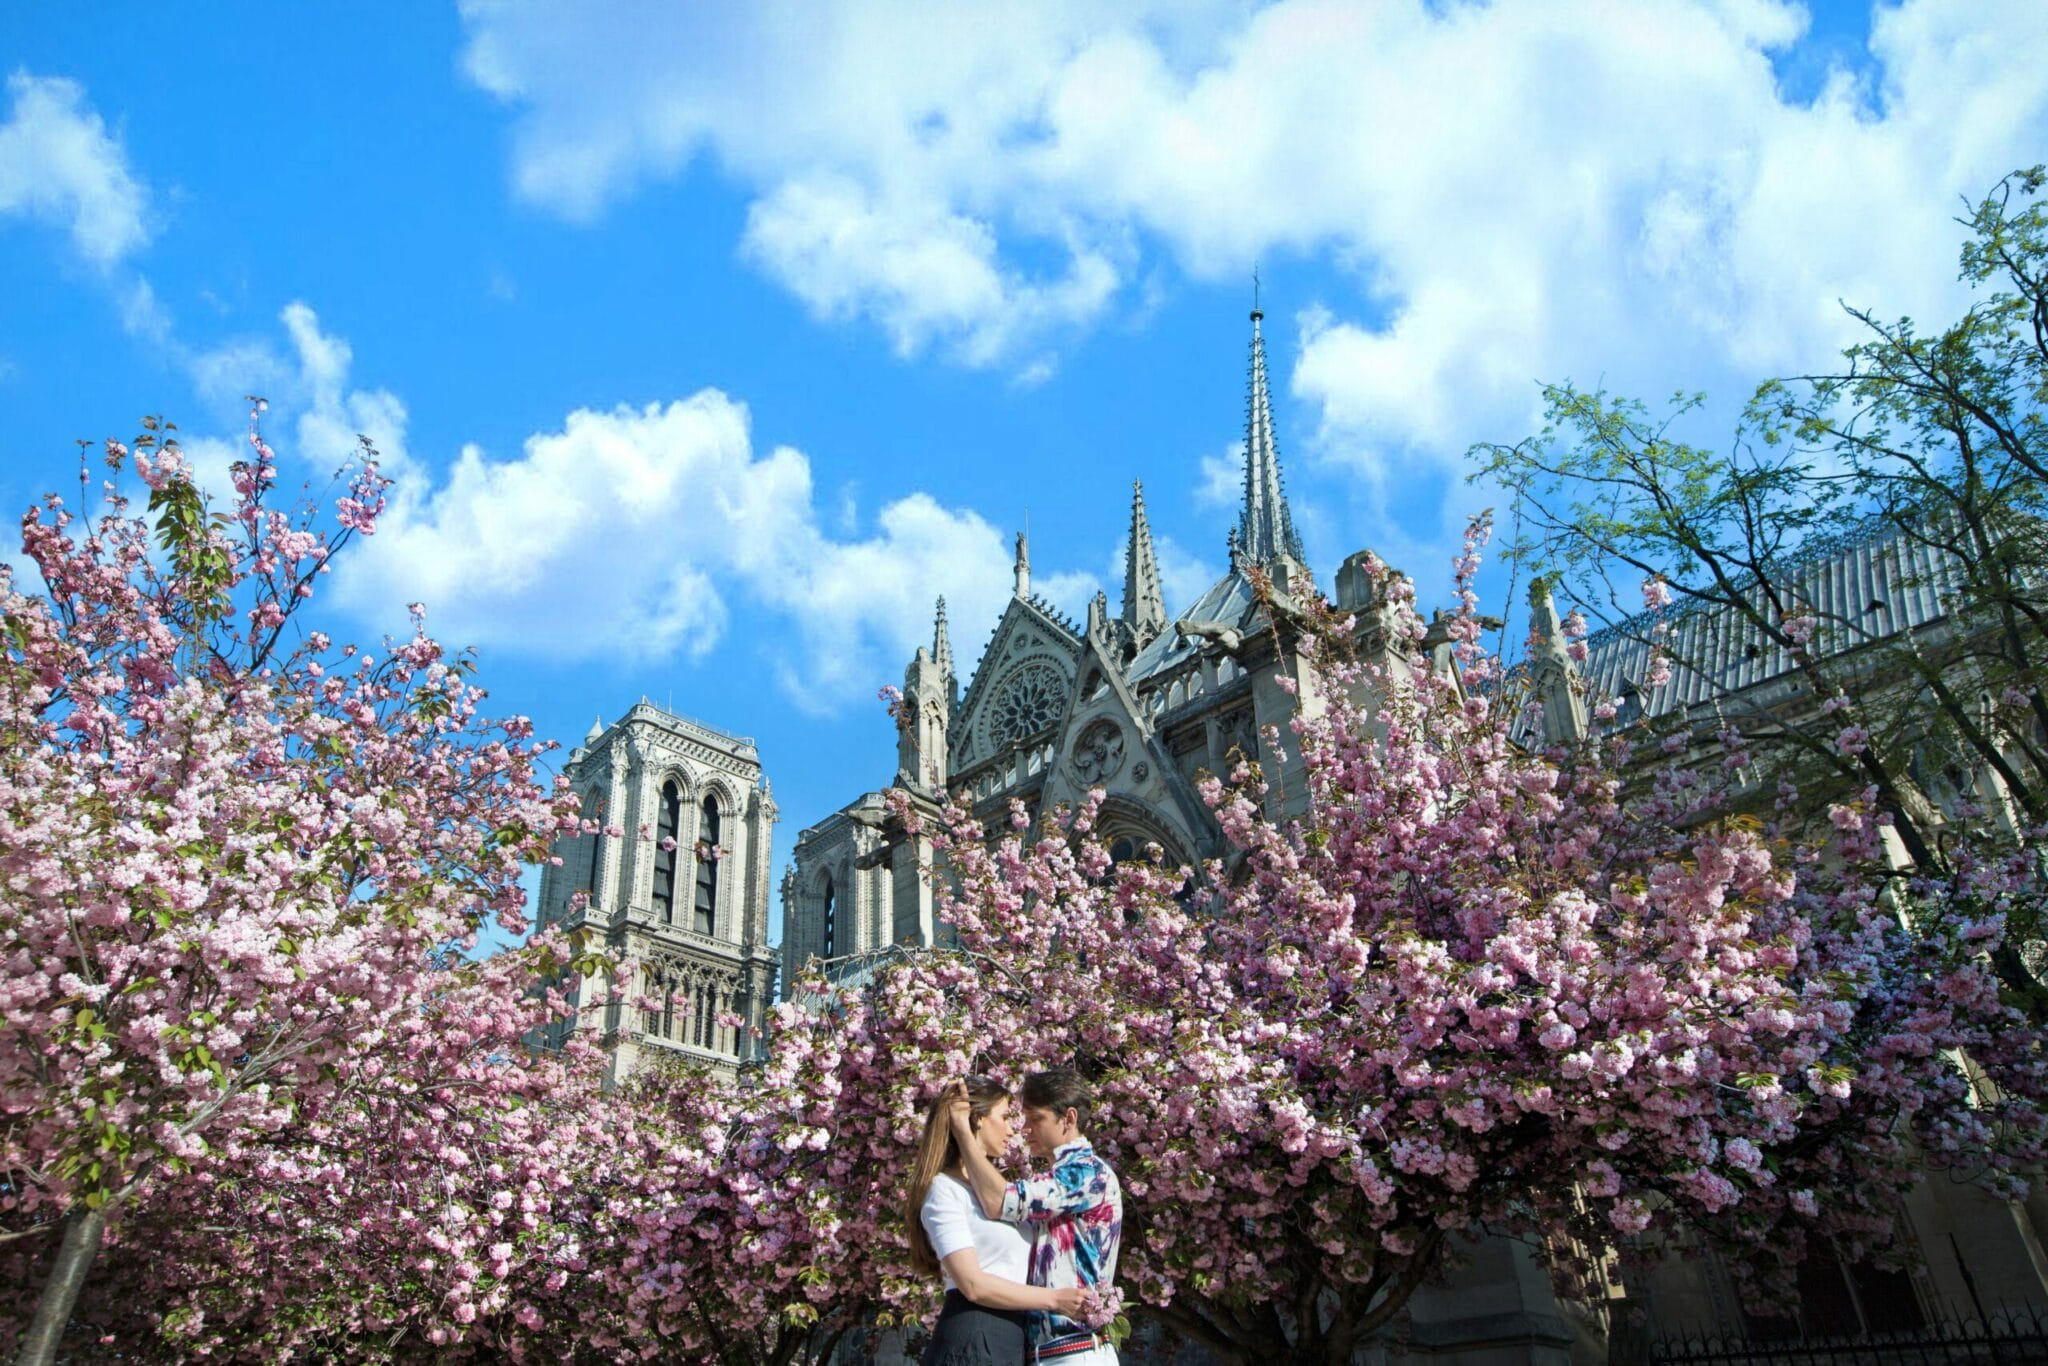 photographer in paris gallery